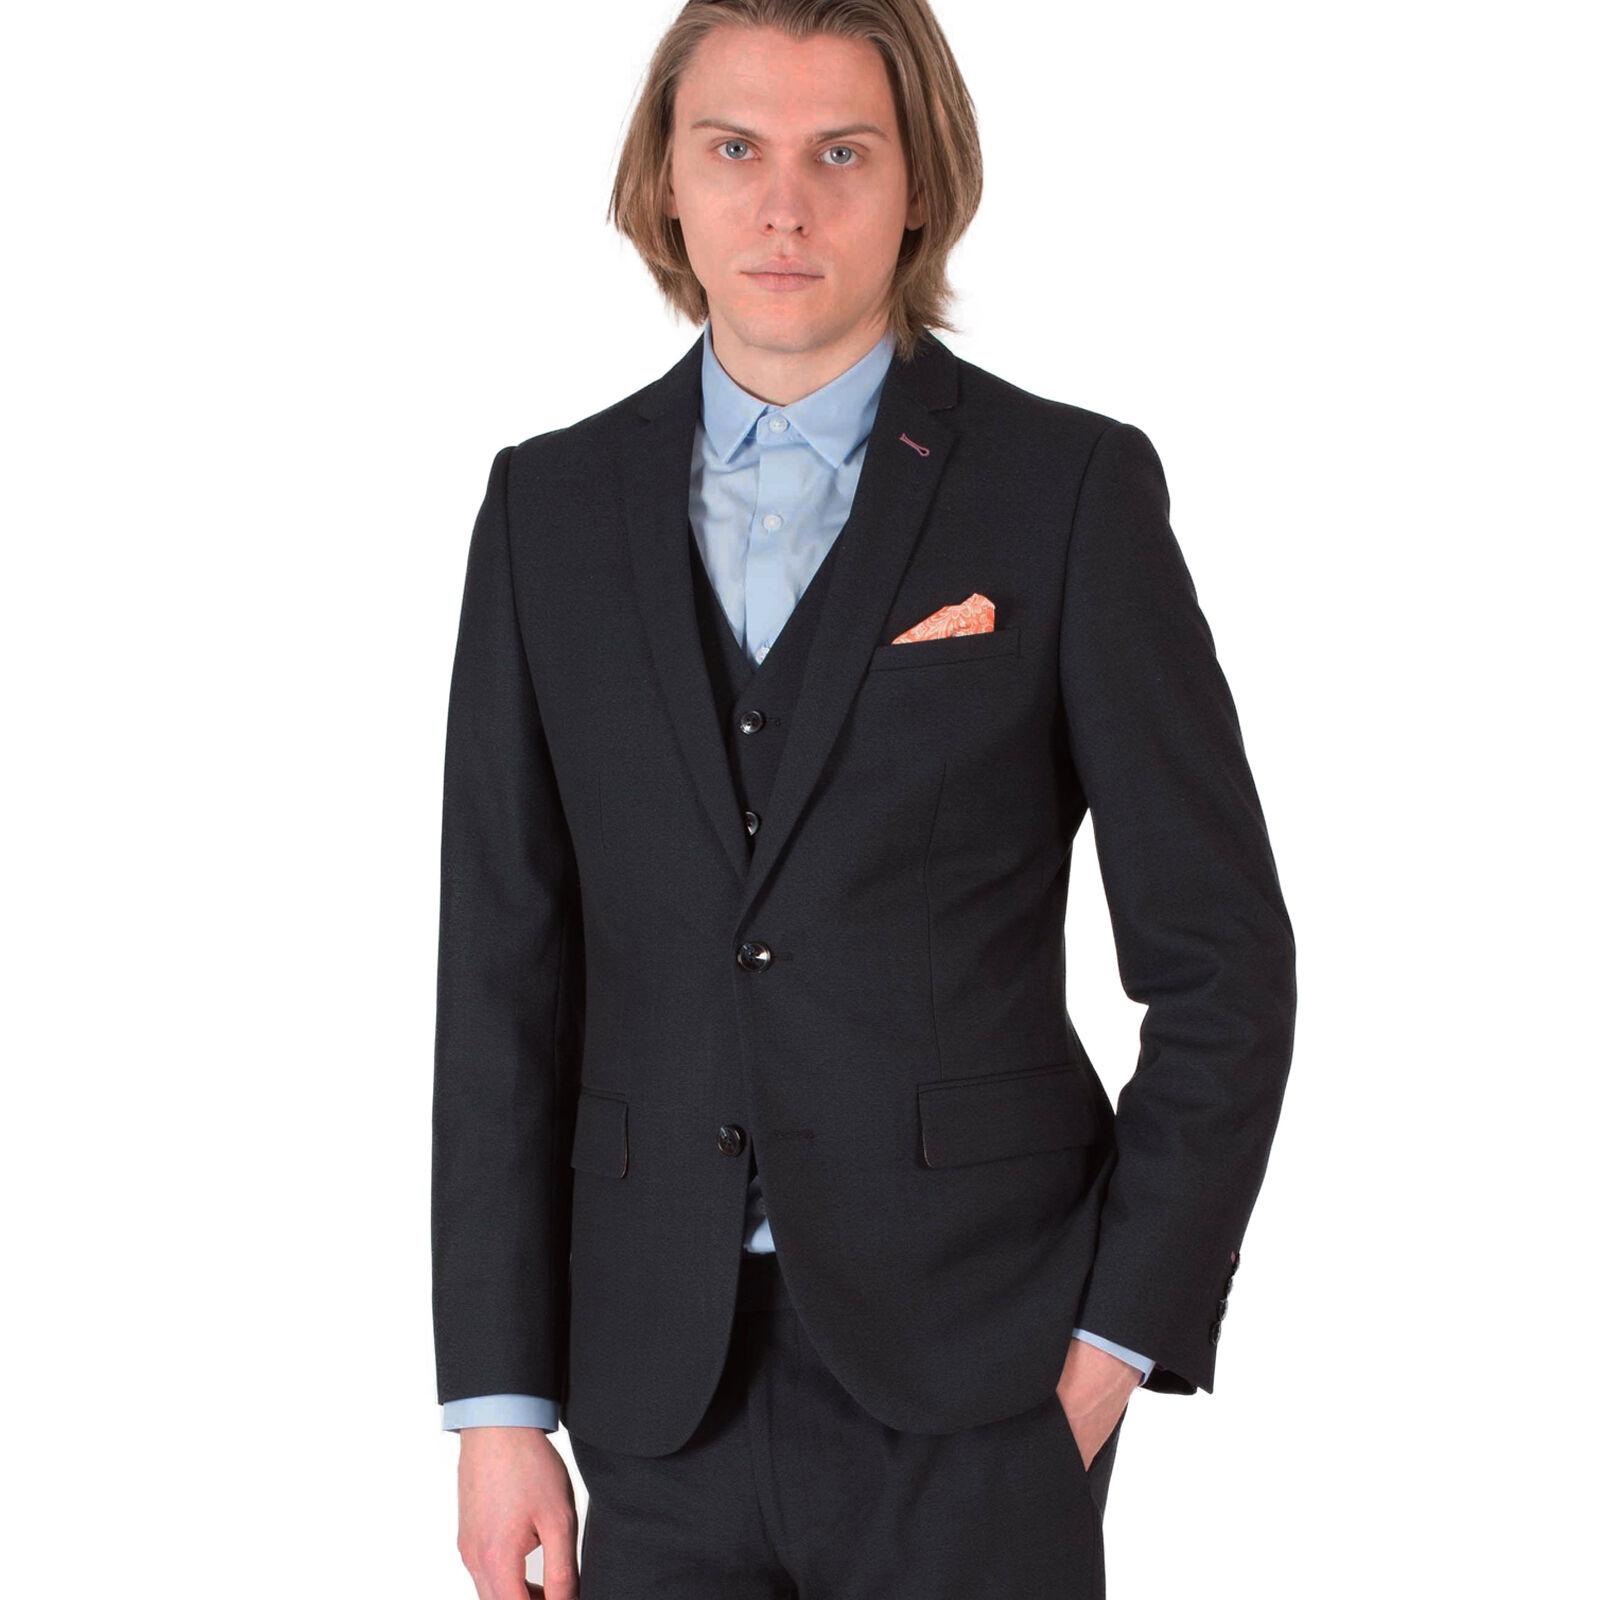 Harry Braun DANDY Three Piece Slim Fit Suit in Navy 540880047